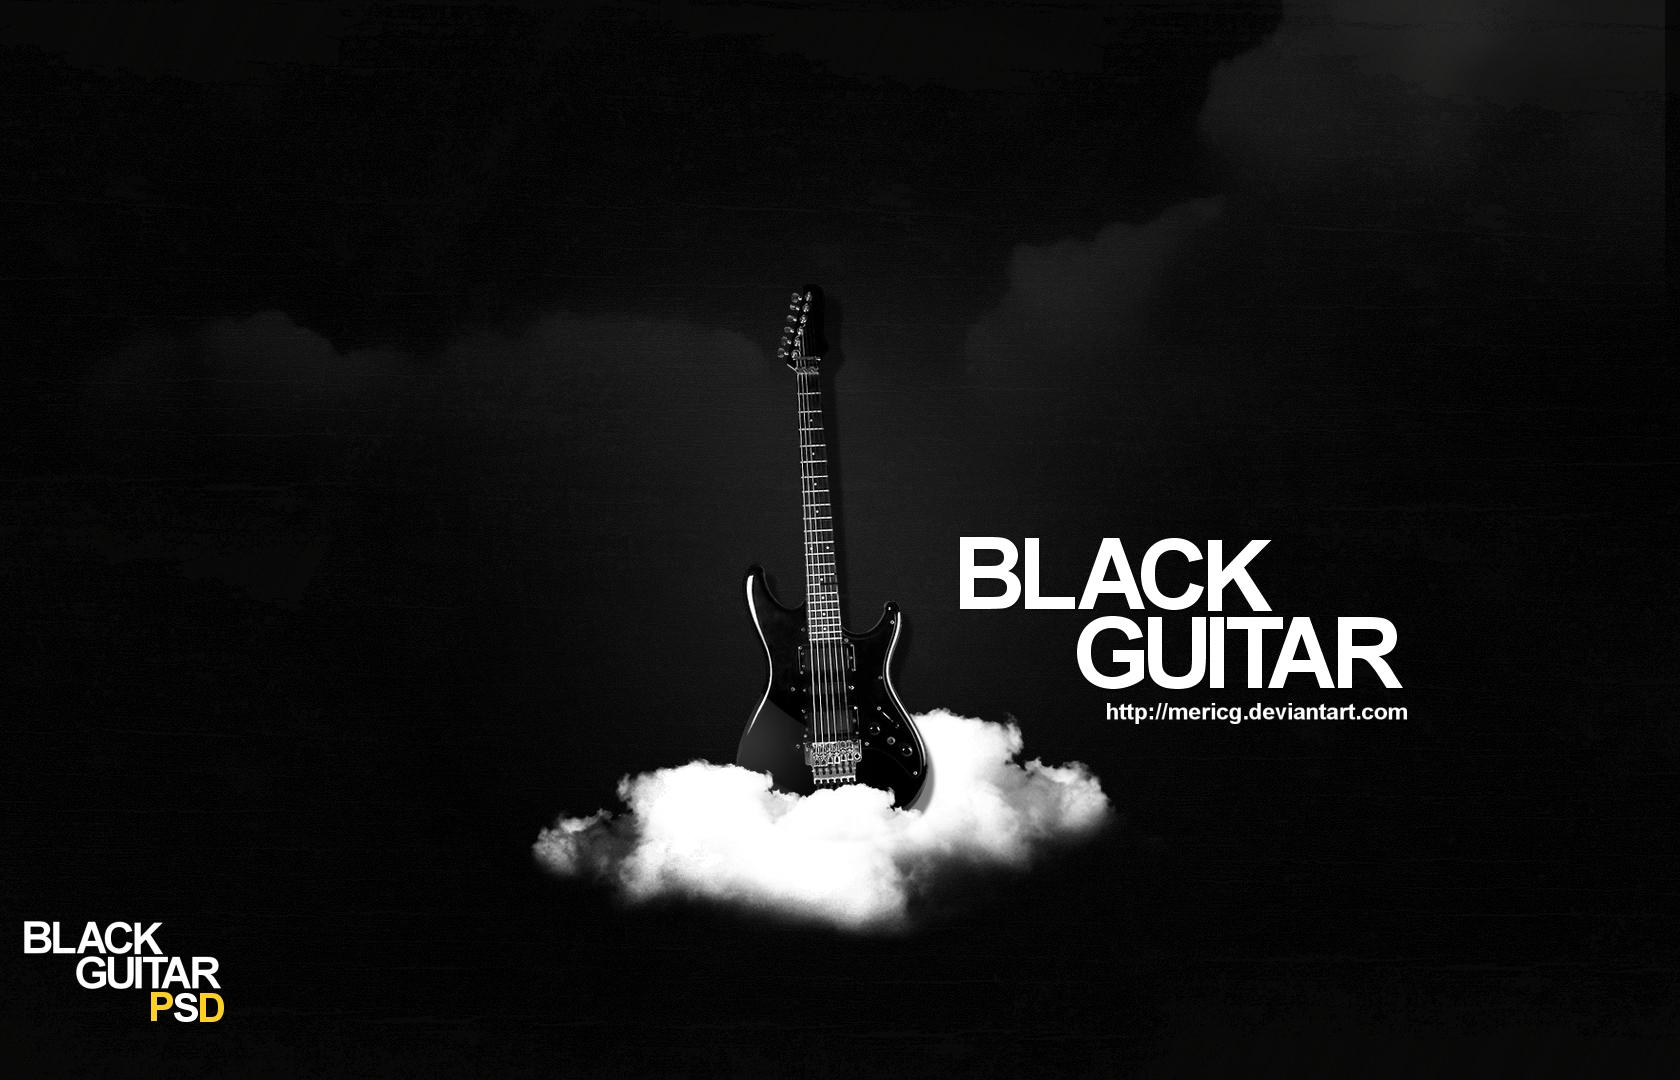 ... photoshop psd files 2010 2014 mericg black guitar psd 1680x1080